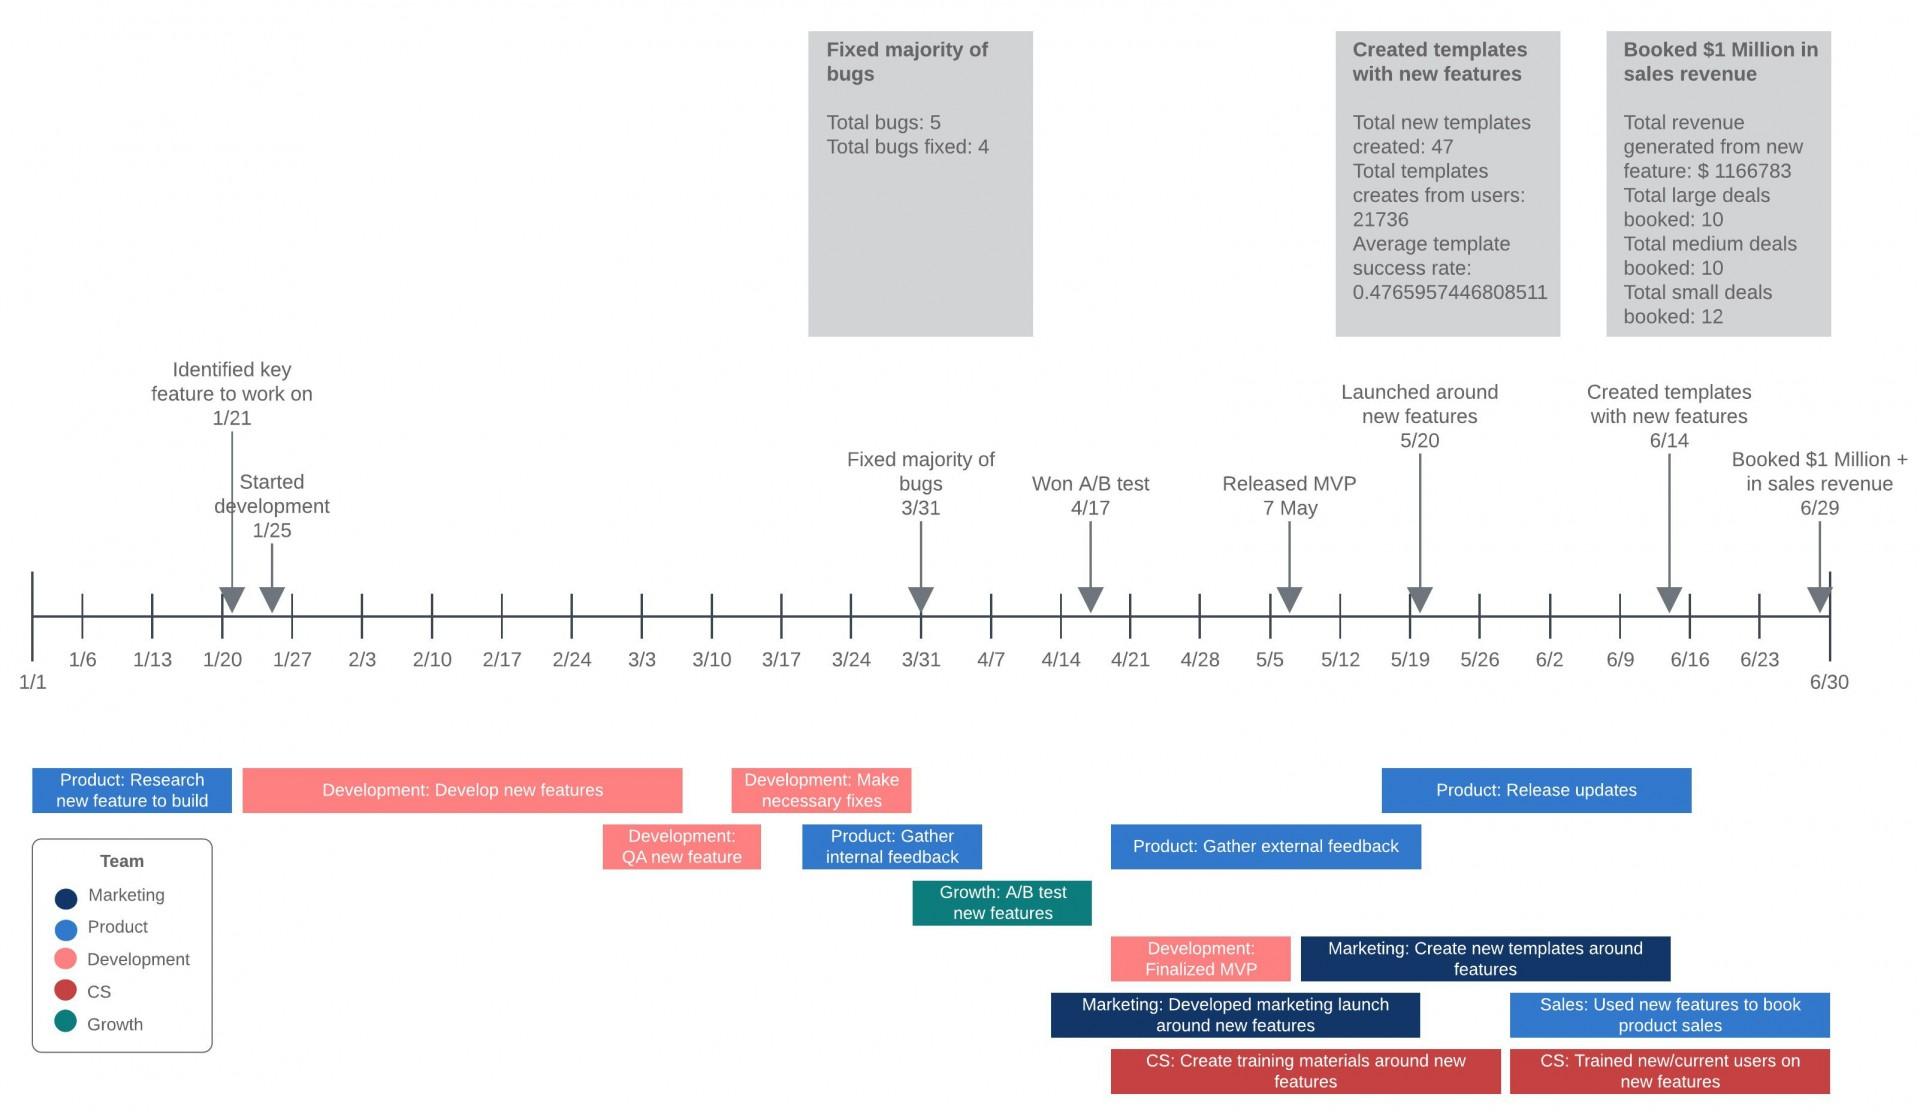 006 Imposing Google Doc Timeline Template Image  Historical1920